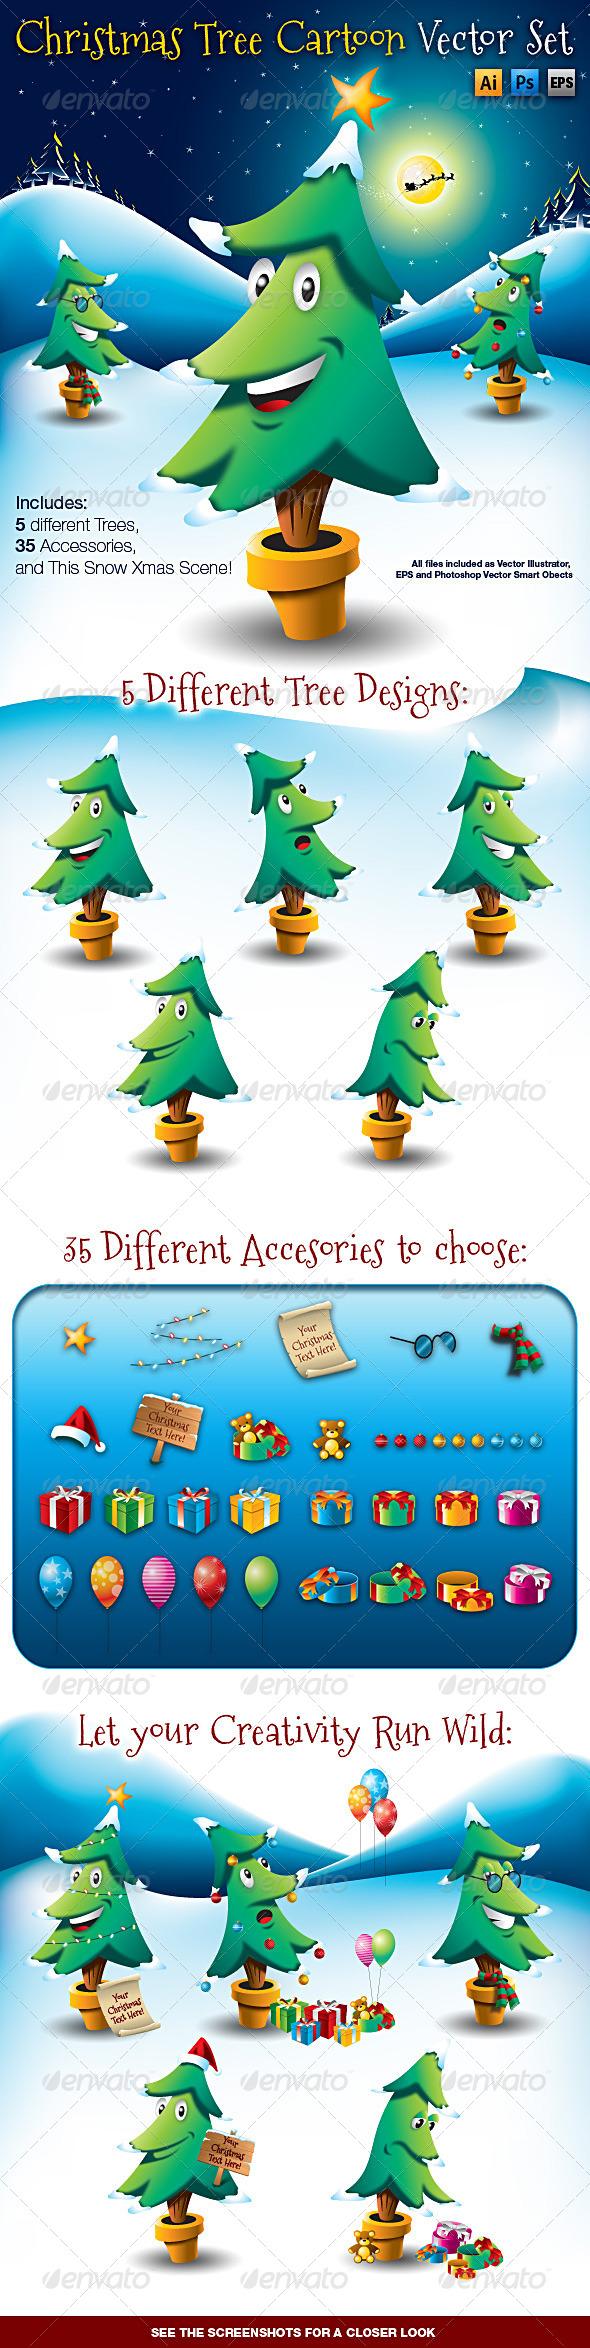 Christmas Tree Cartoon Vector Set